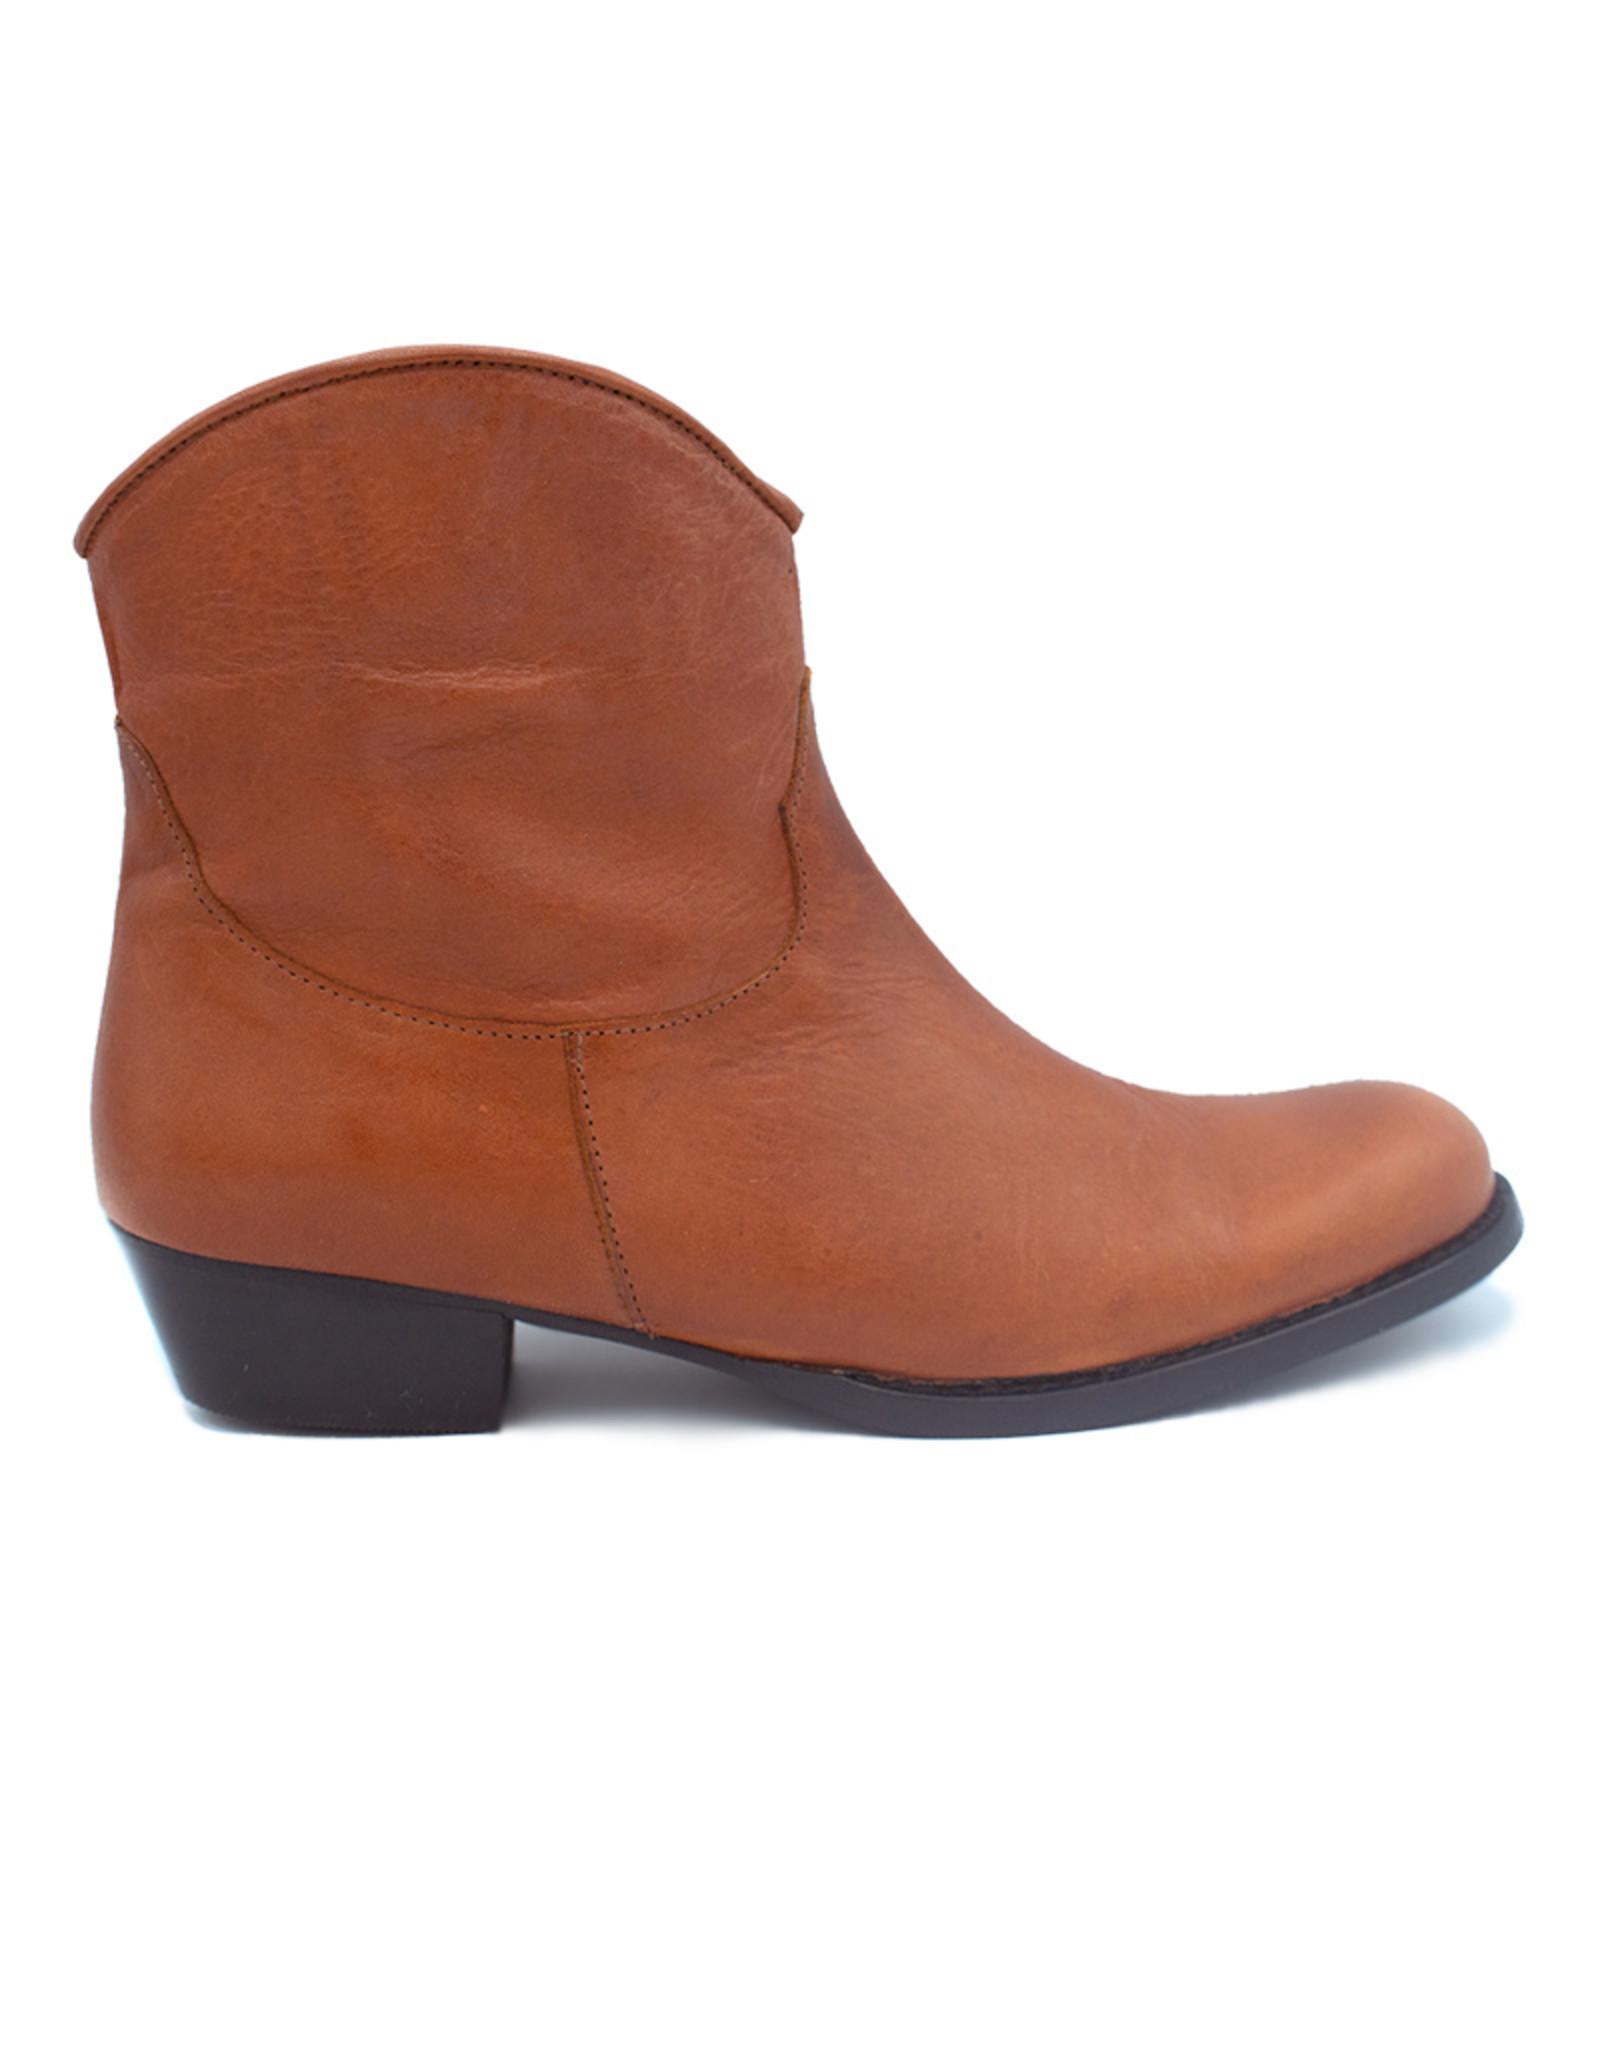 ELI ELI camel cowgirl boot